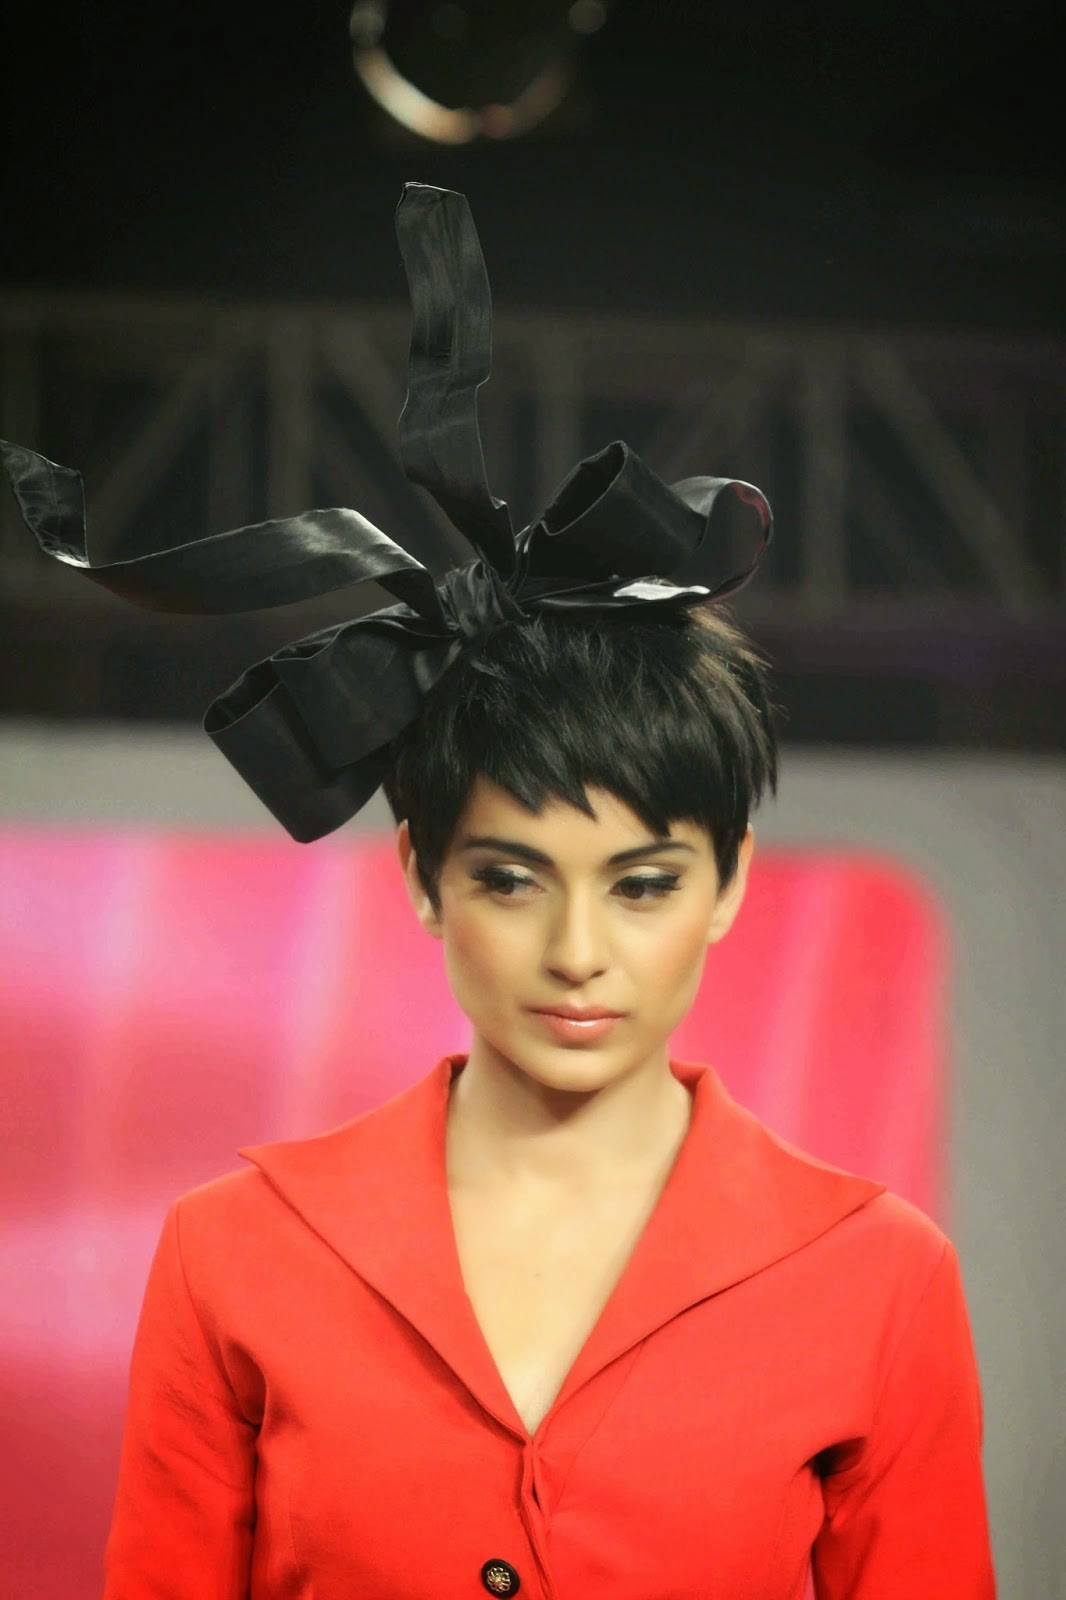 Kangana Ranaut Looks Smoking Hot On The Ramp At Birla Cellulose 'LIVA' Brand Launch